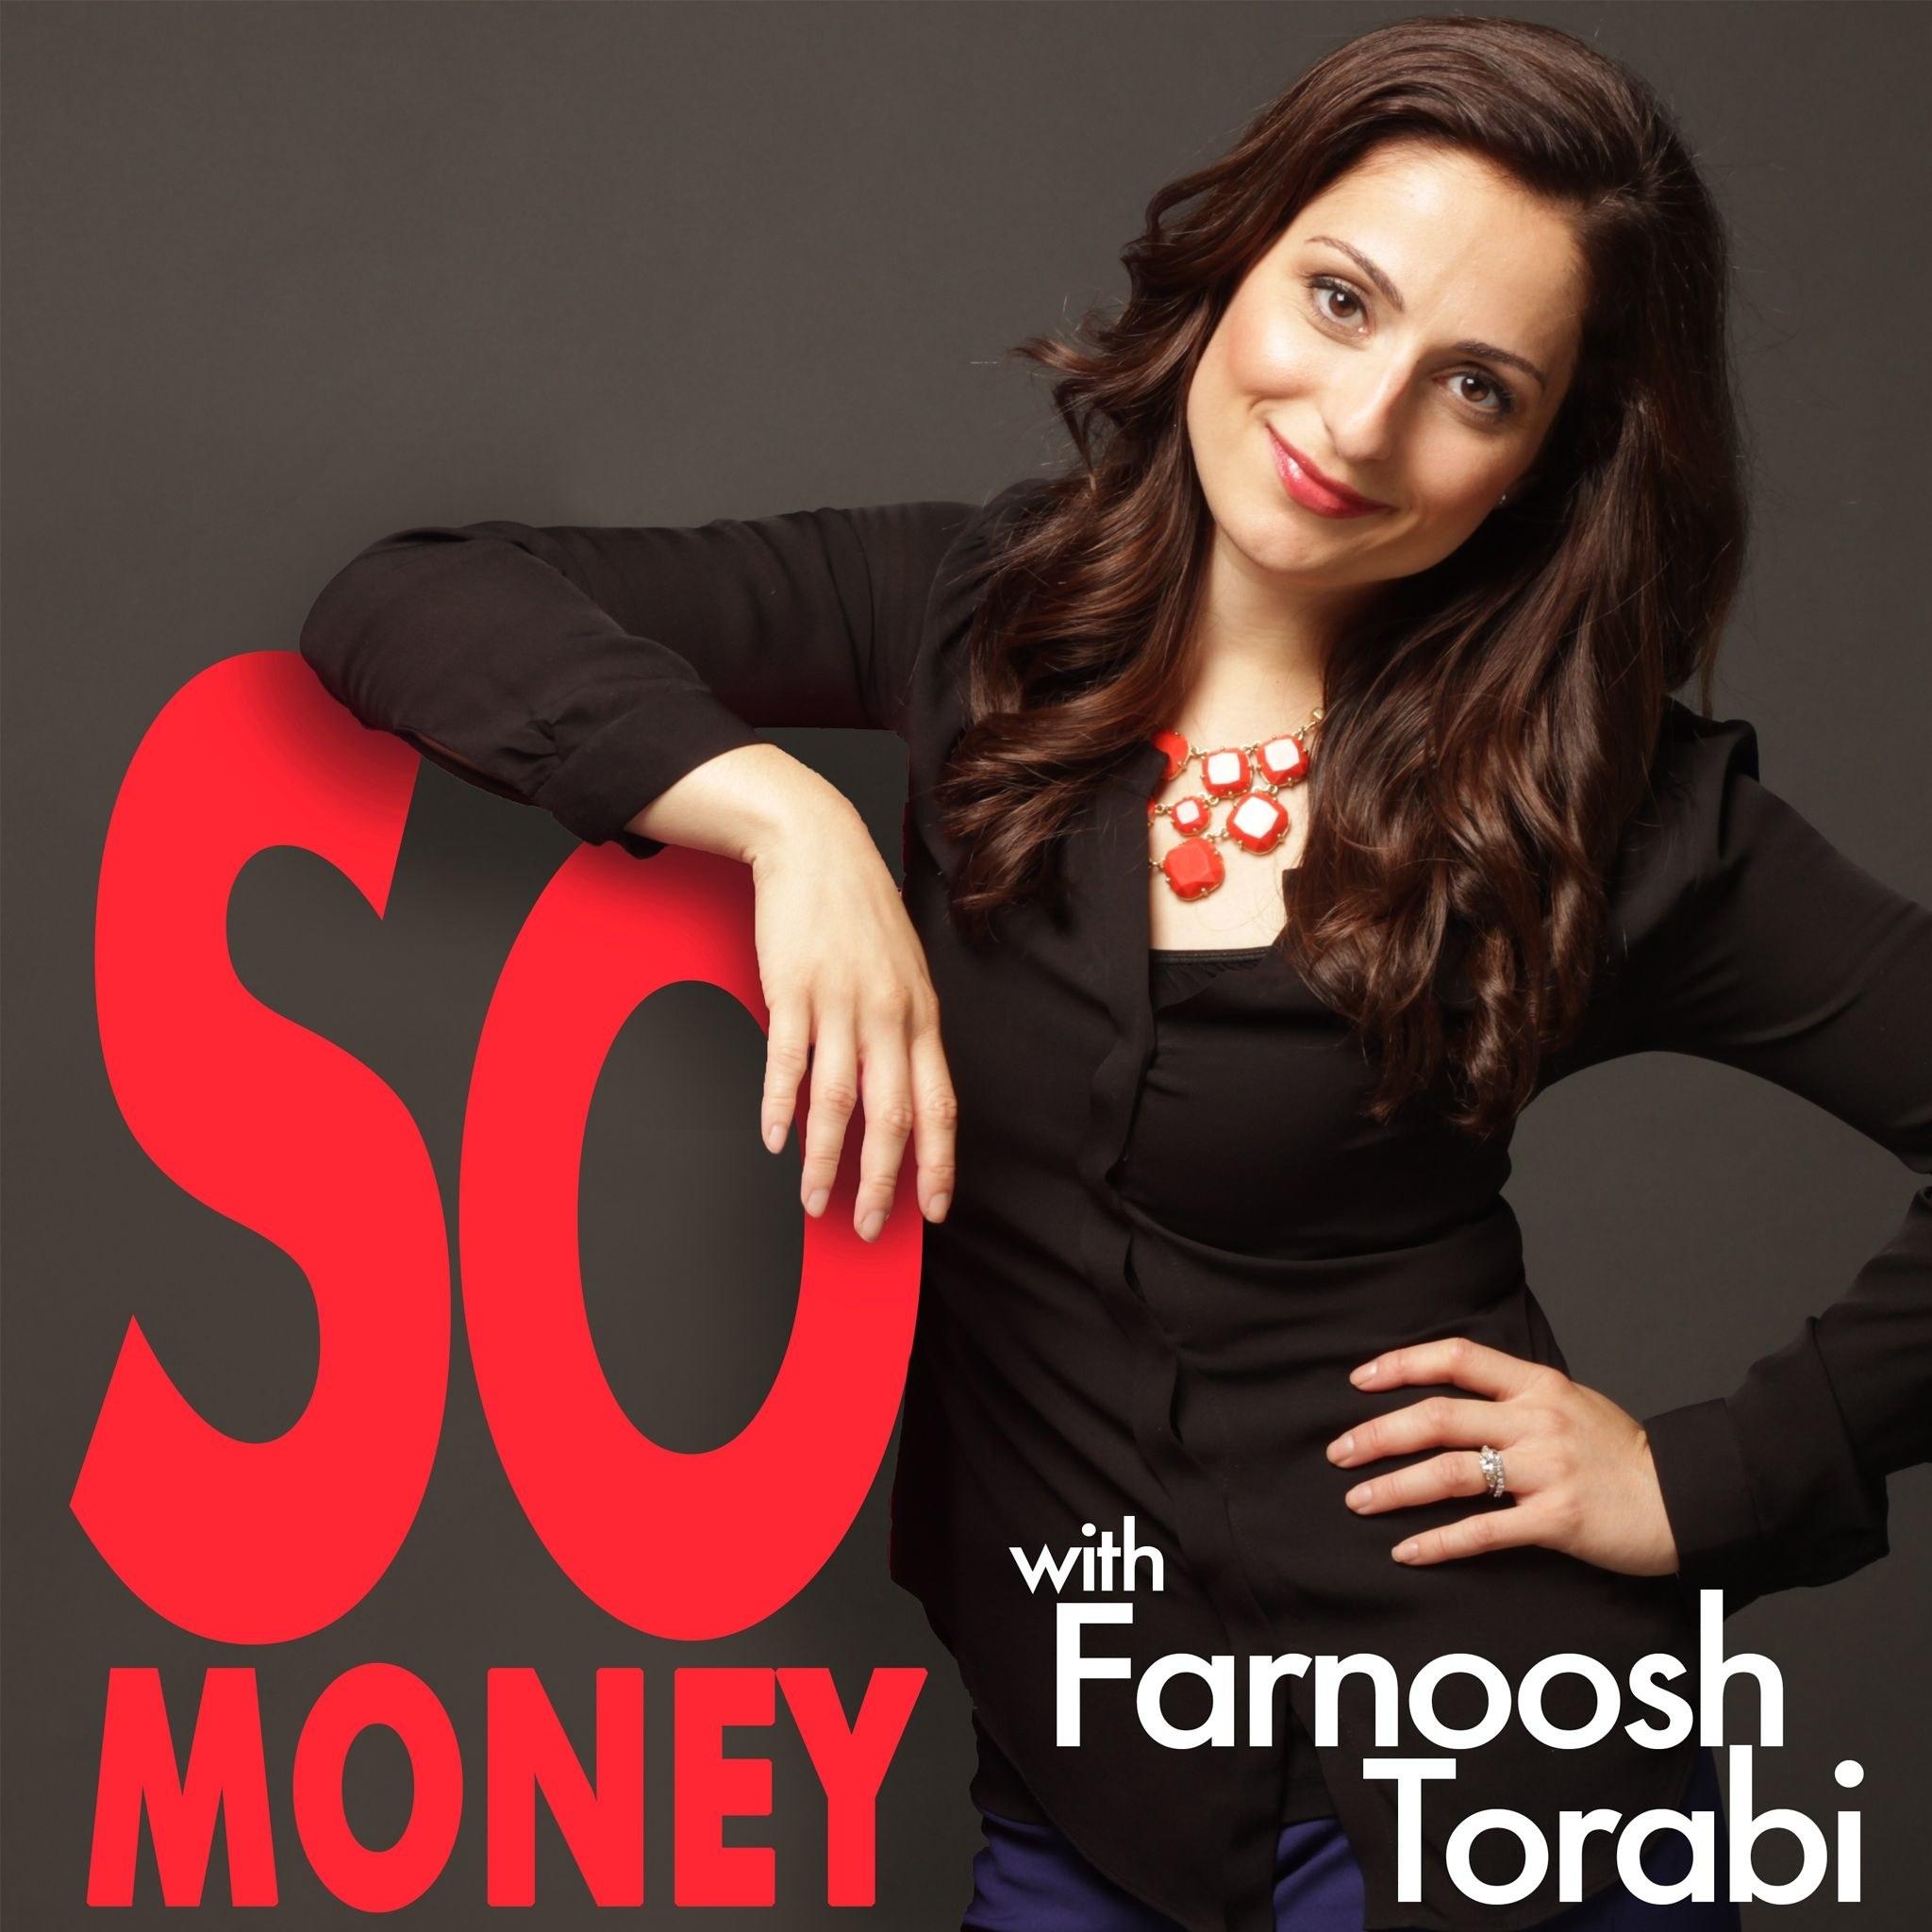 Farnoosh Torabi, host of So Money podcast